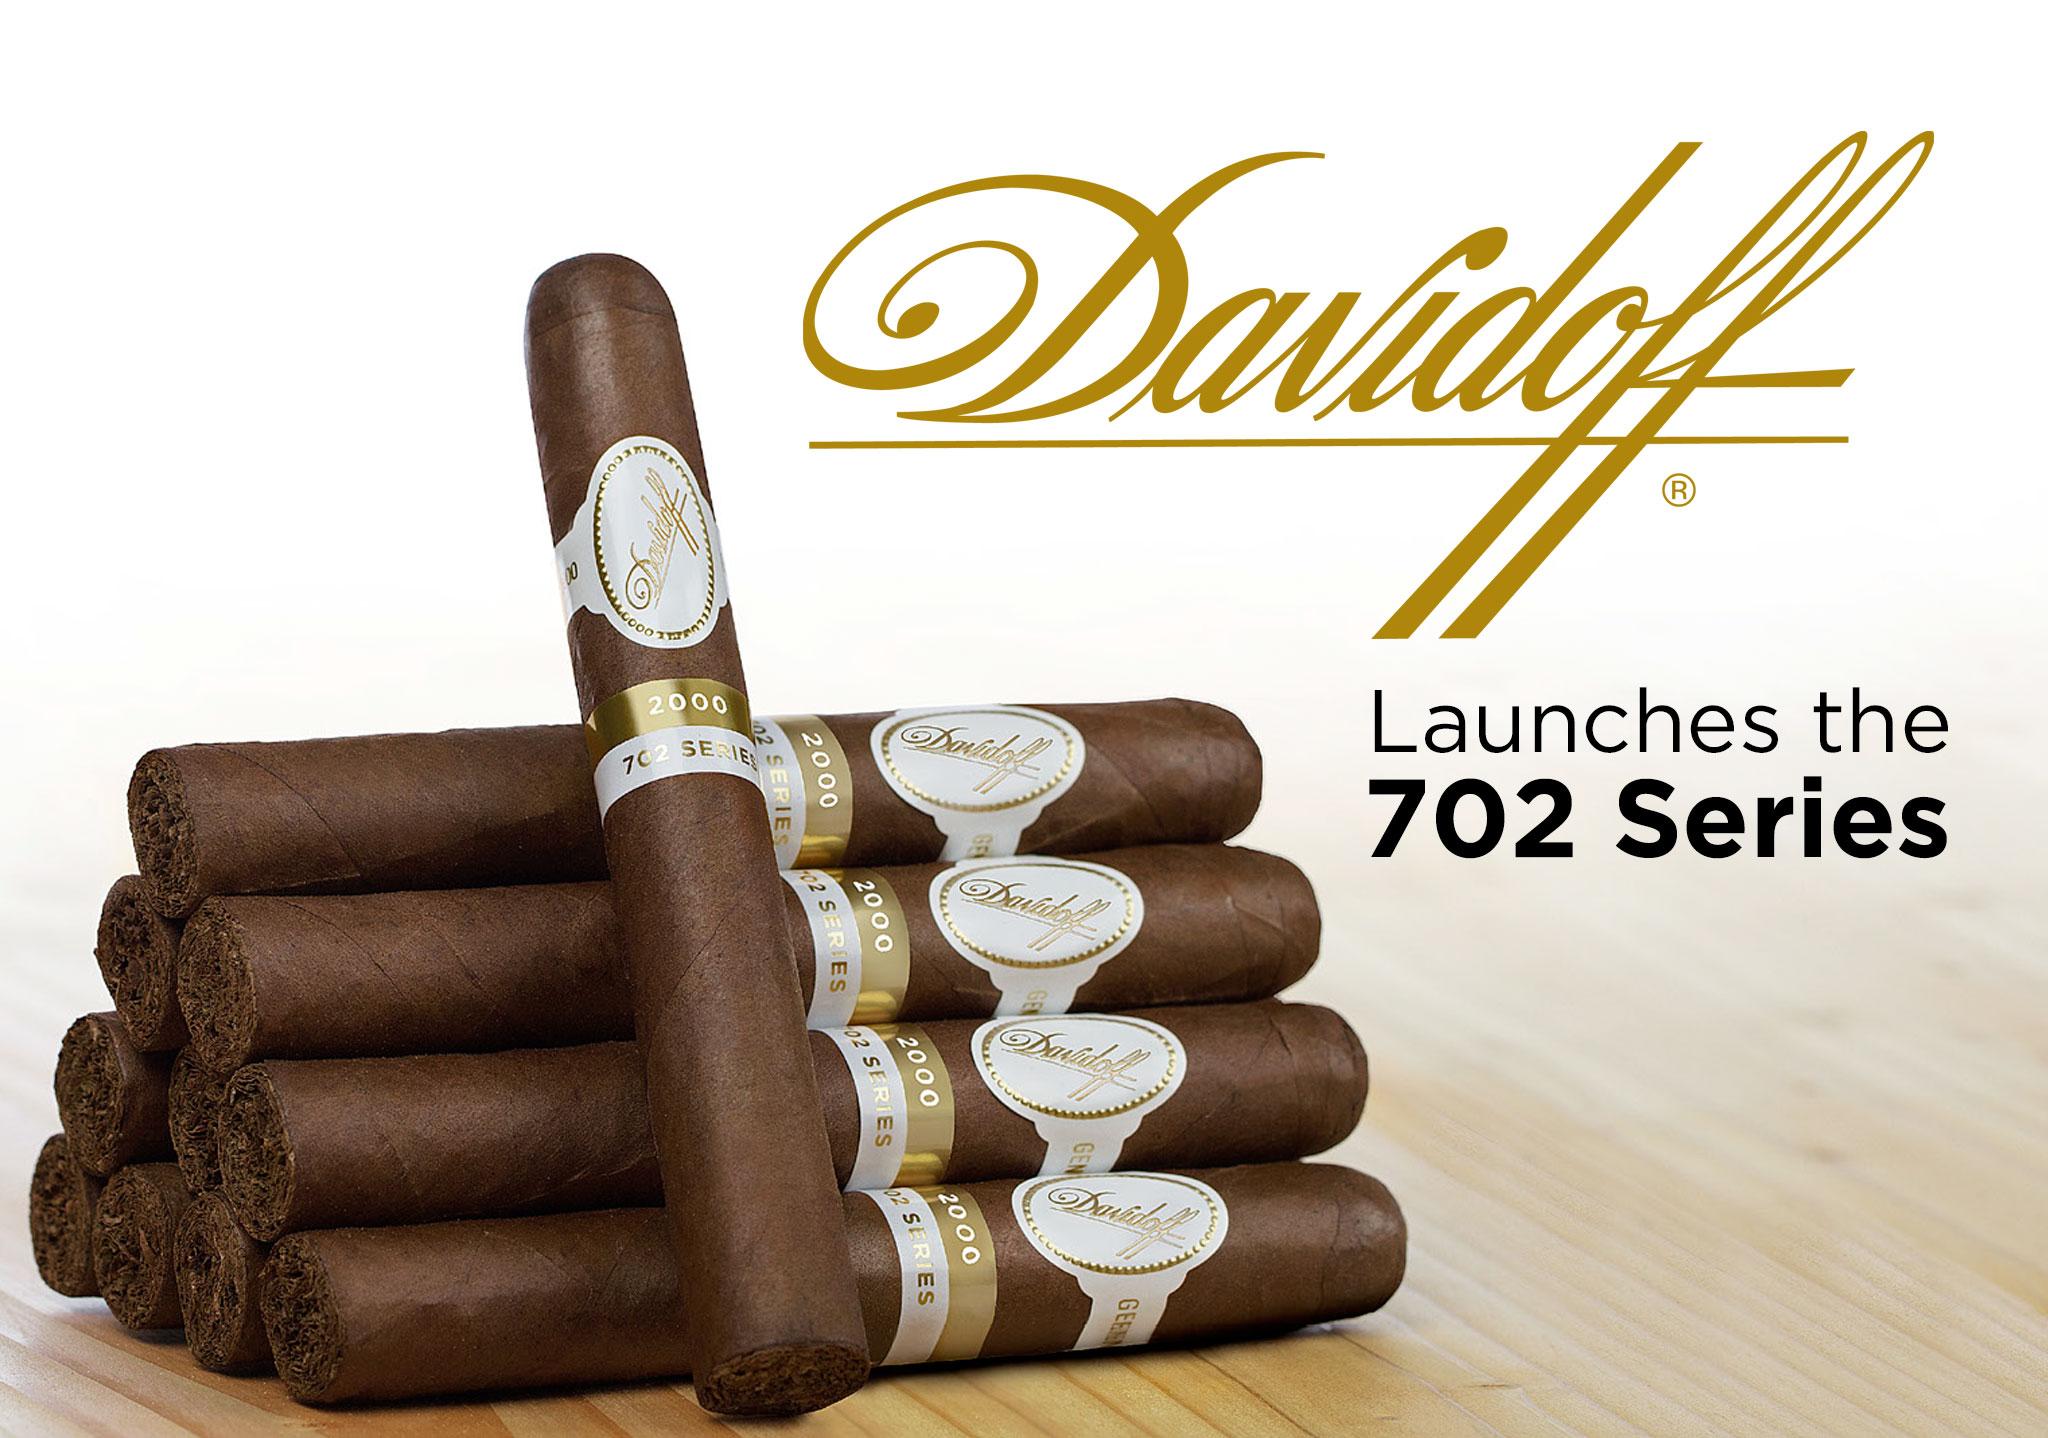 Davidoff 702 cigars